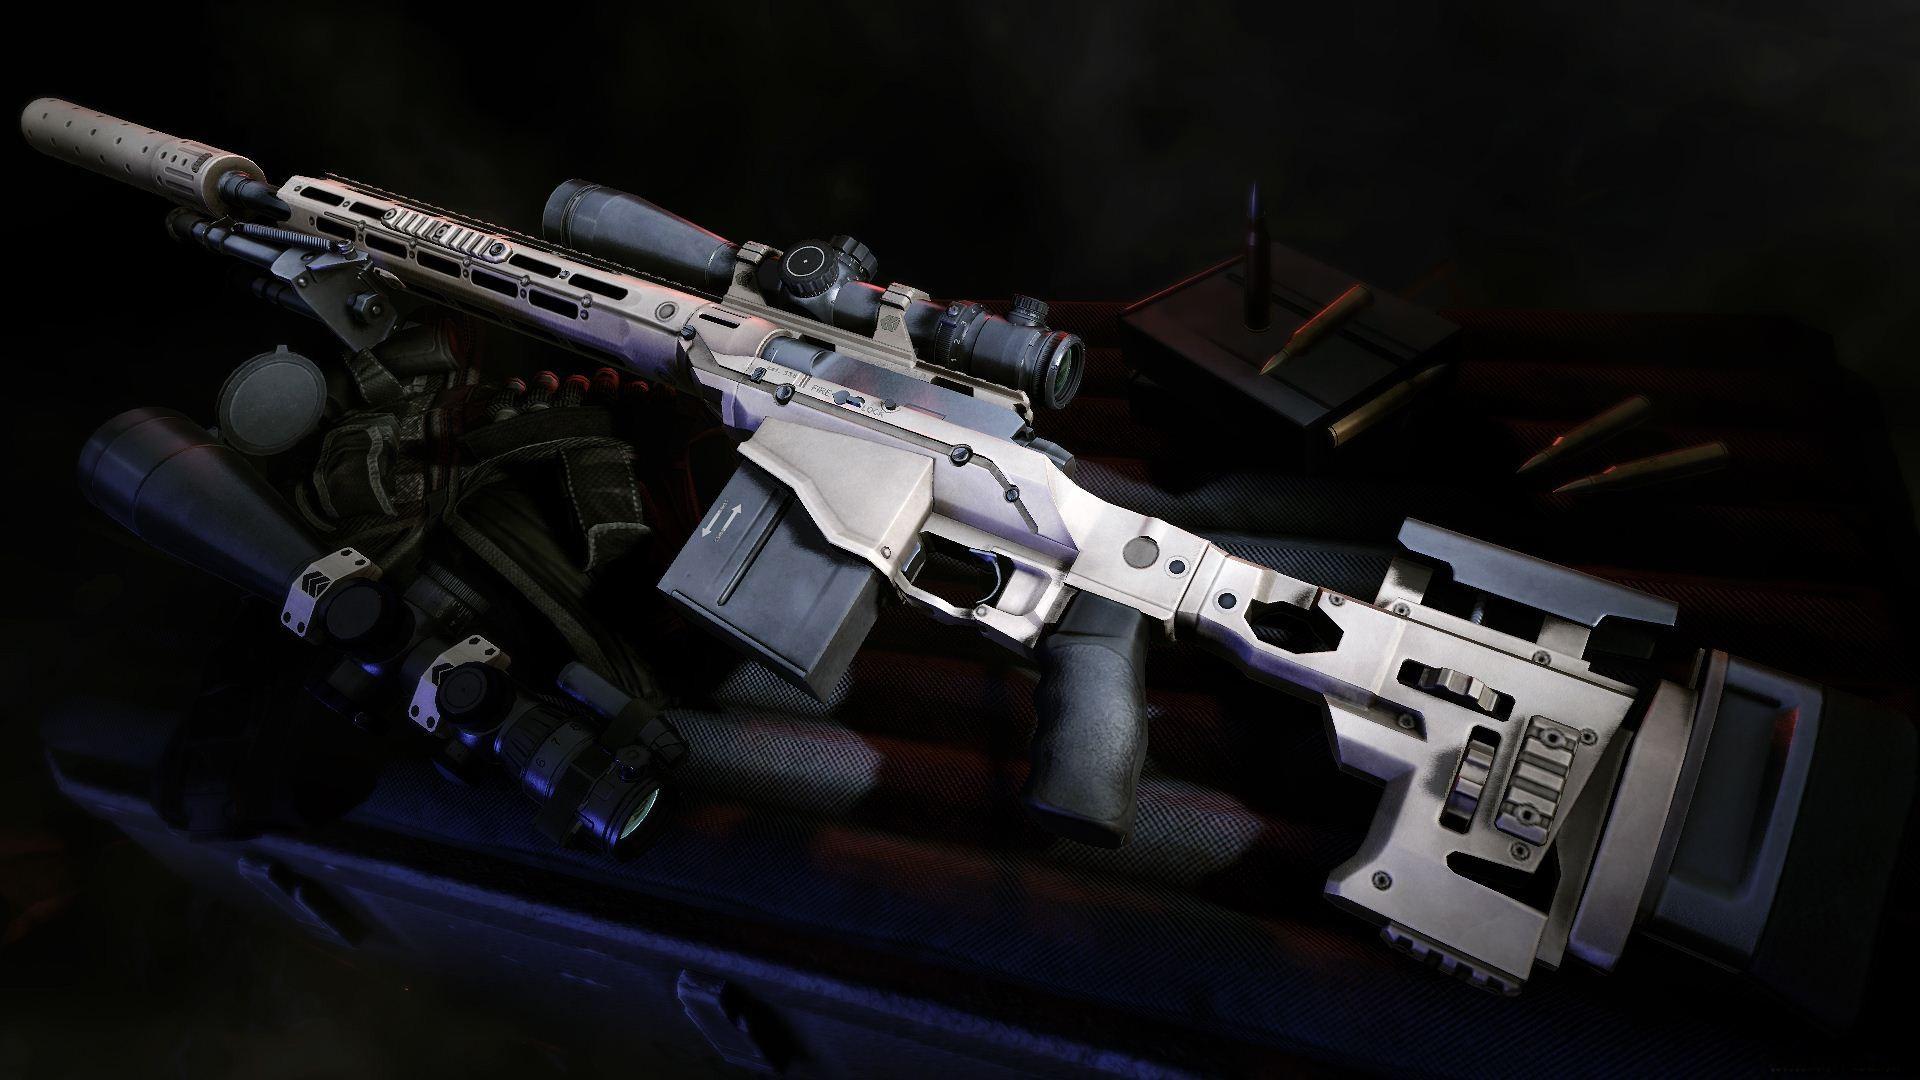 Sniper Ghost Warrior 2 game rifle sniper ghost warrior 1920x1080